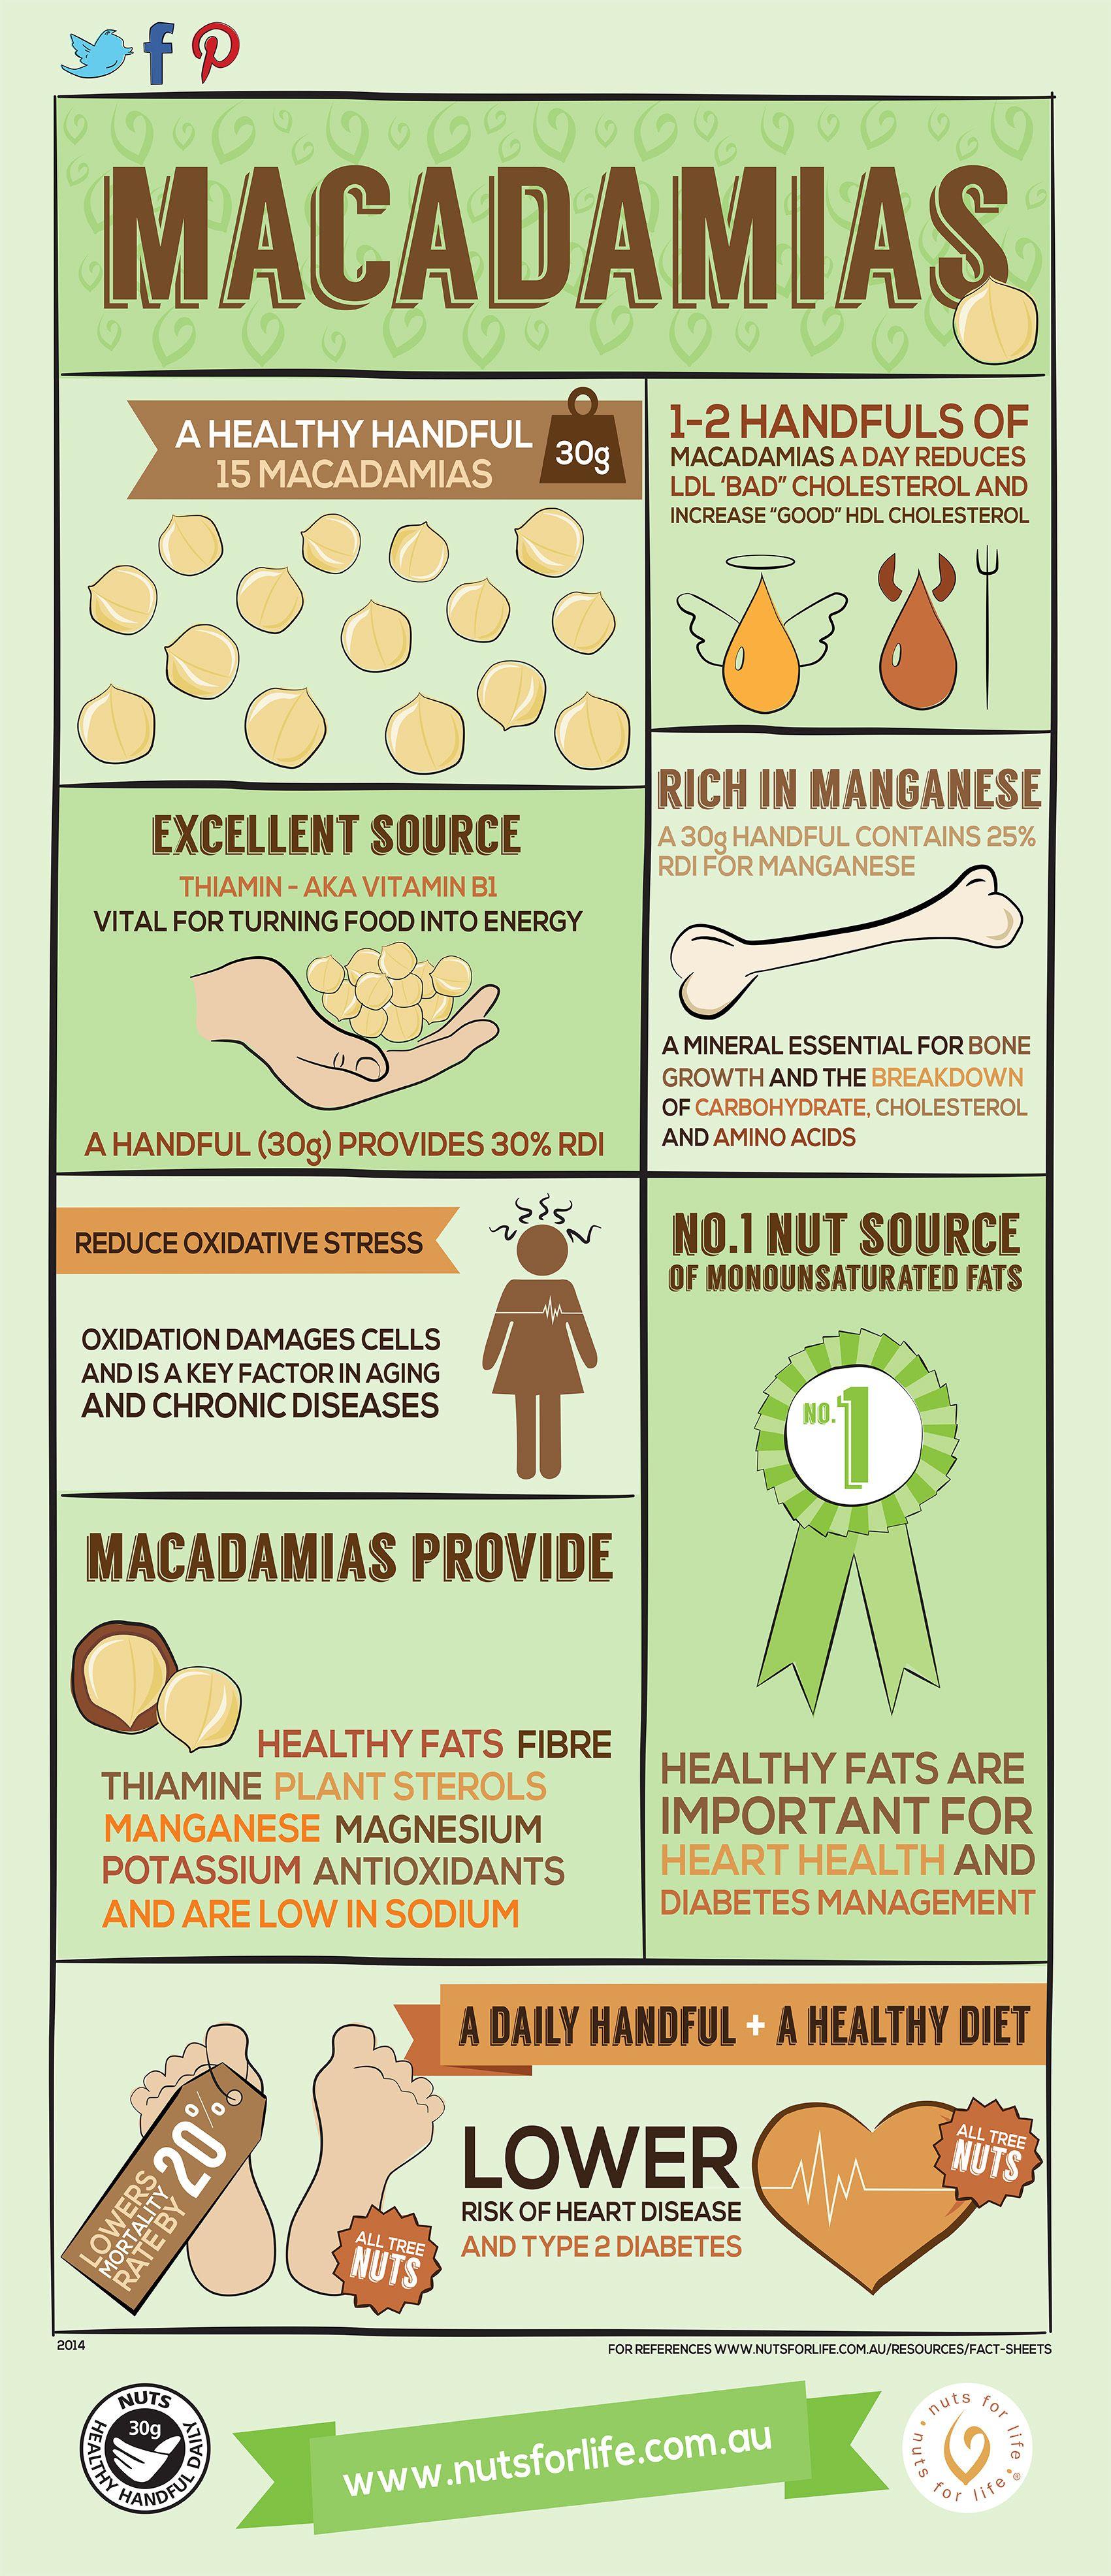 Health Information About Macadamias Macadamia Macadamianut Australianmacadamias Http Www Australian Maca Macadamia Nut Benefits Nut Benefits Milk Benefits